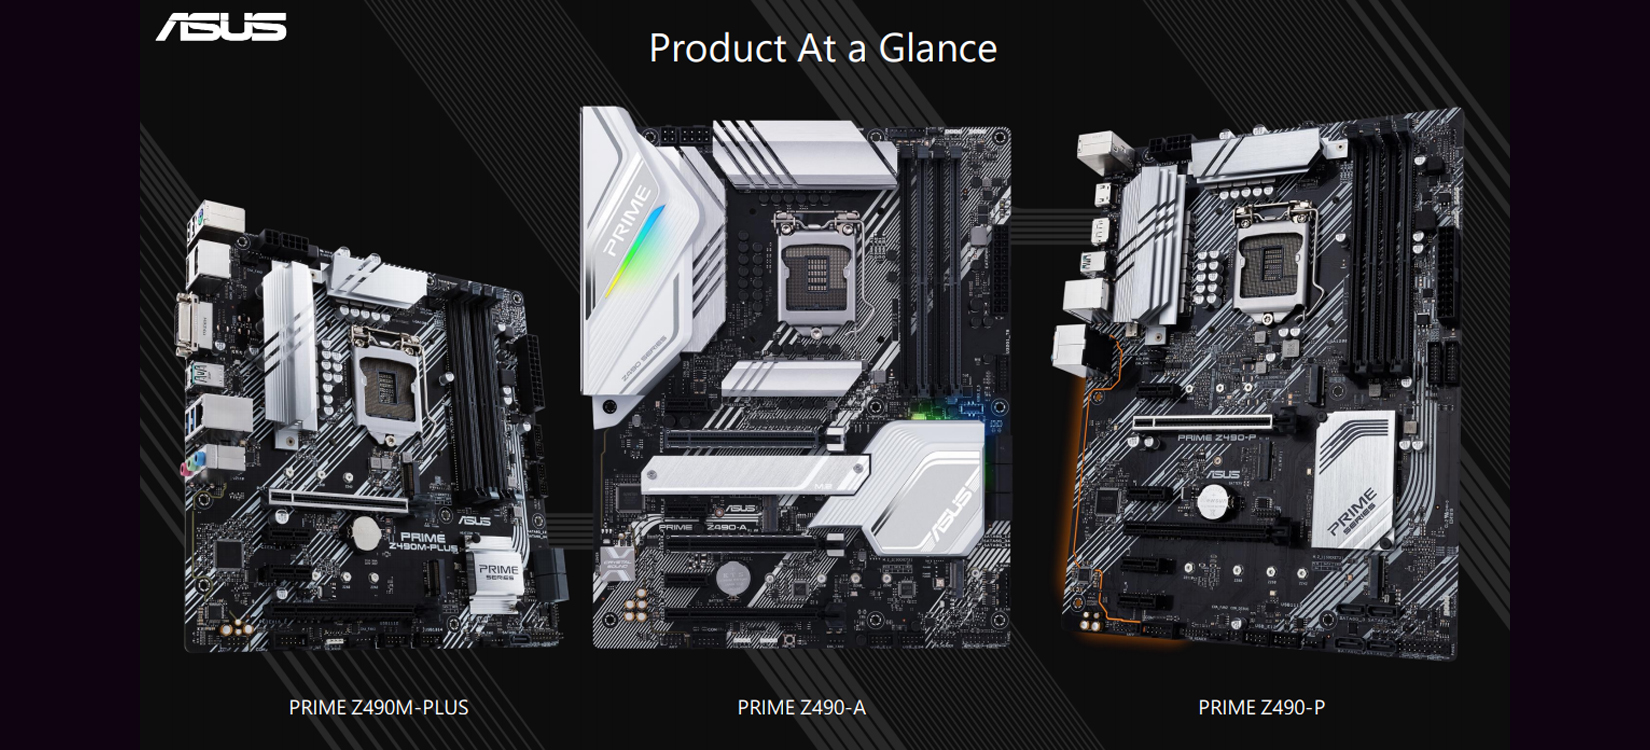 Mainboard ASUS PRIME Z490M-PLUS (Intel Z490, Socket 1200, m-ATX, 4 khe RAM DDR4)